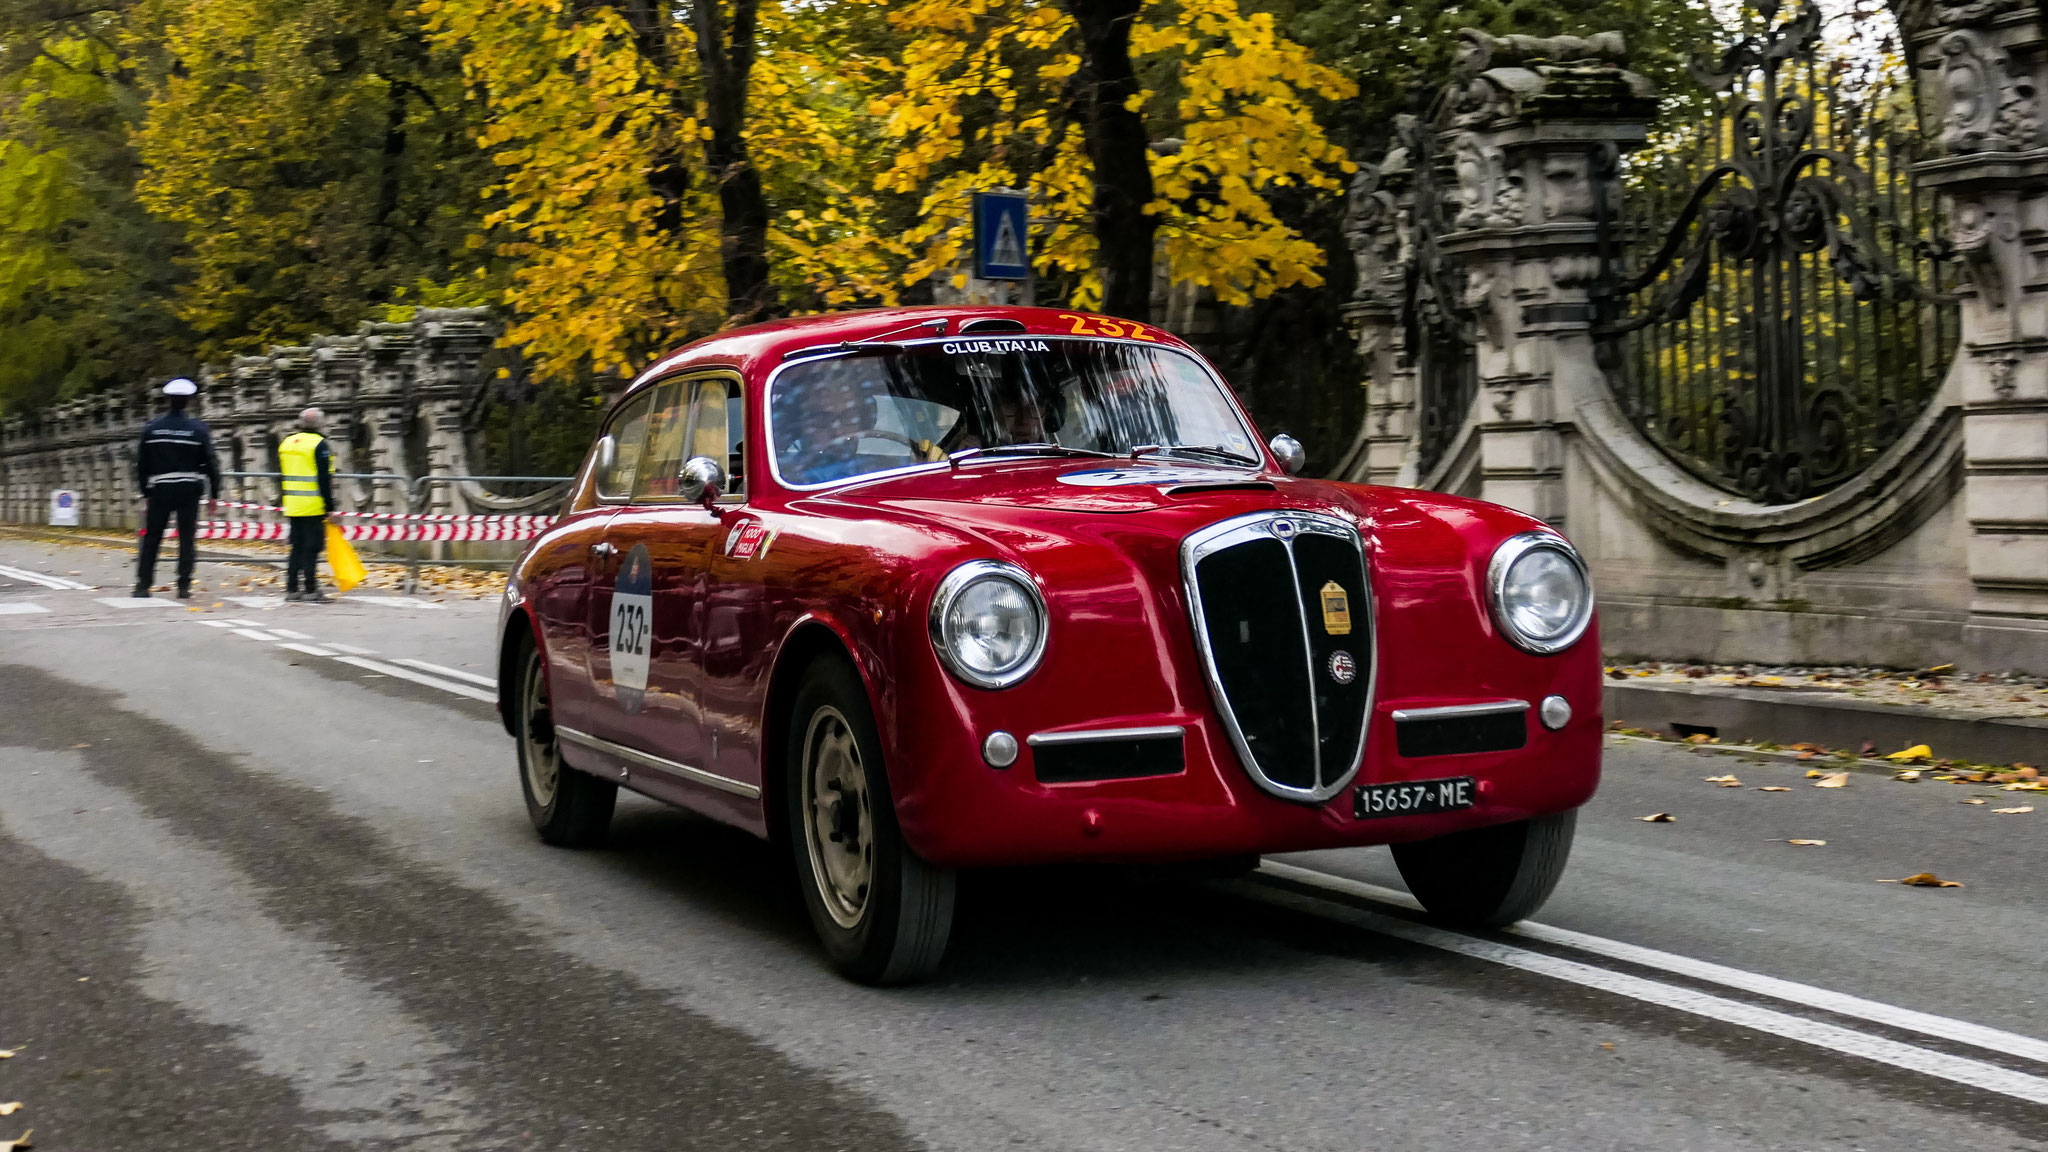 Lancia Aurelia B20 GT 2500 - 15657-ME (ITA)